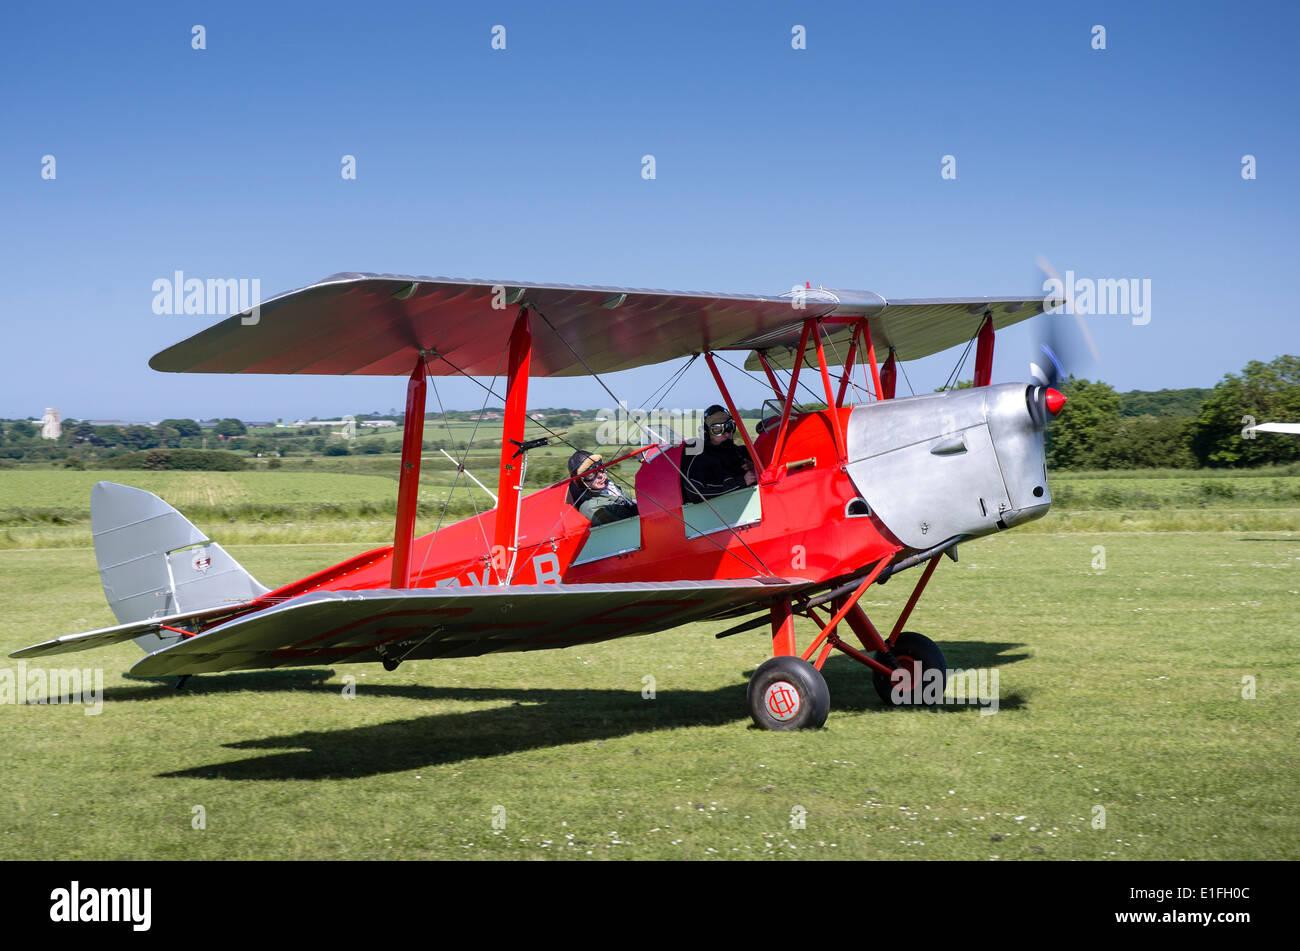 DH82A De Havilland Tiger Moth G-BYLB biplane at Northrepps Airfield Norfolk - Stock Image